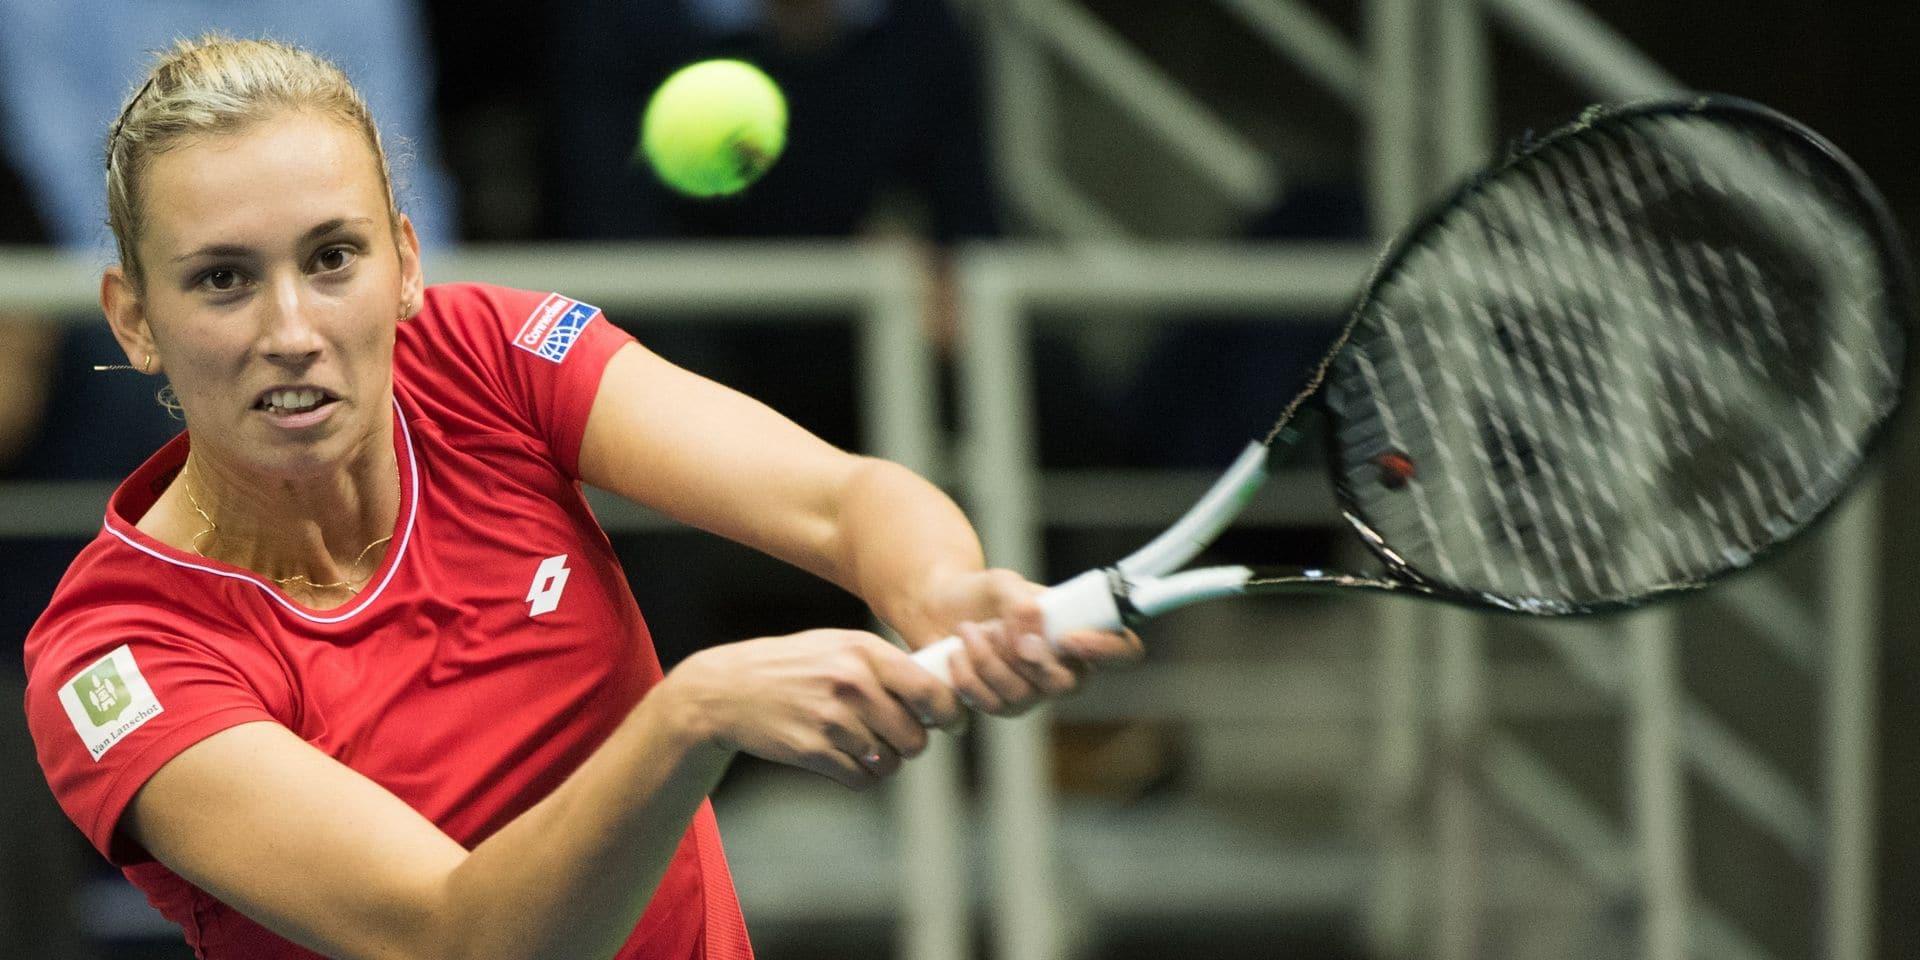 Elise Mertens avance en 8e de finale où elle défiera Simona Halep